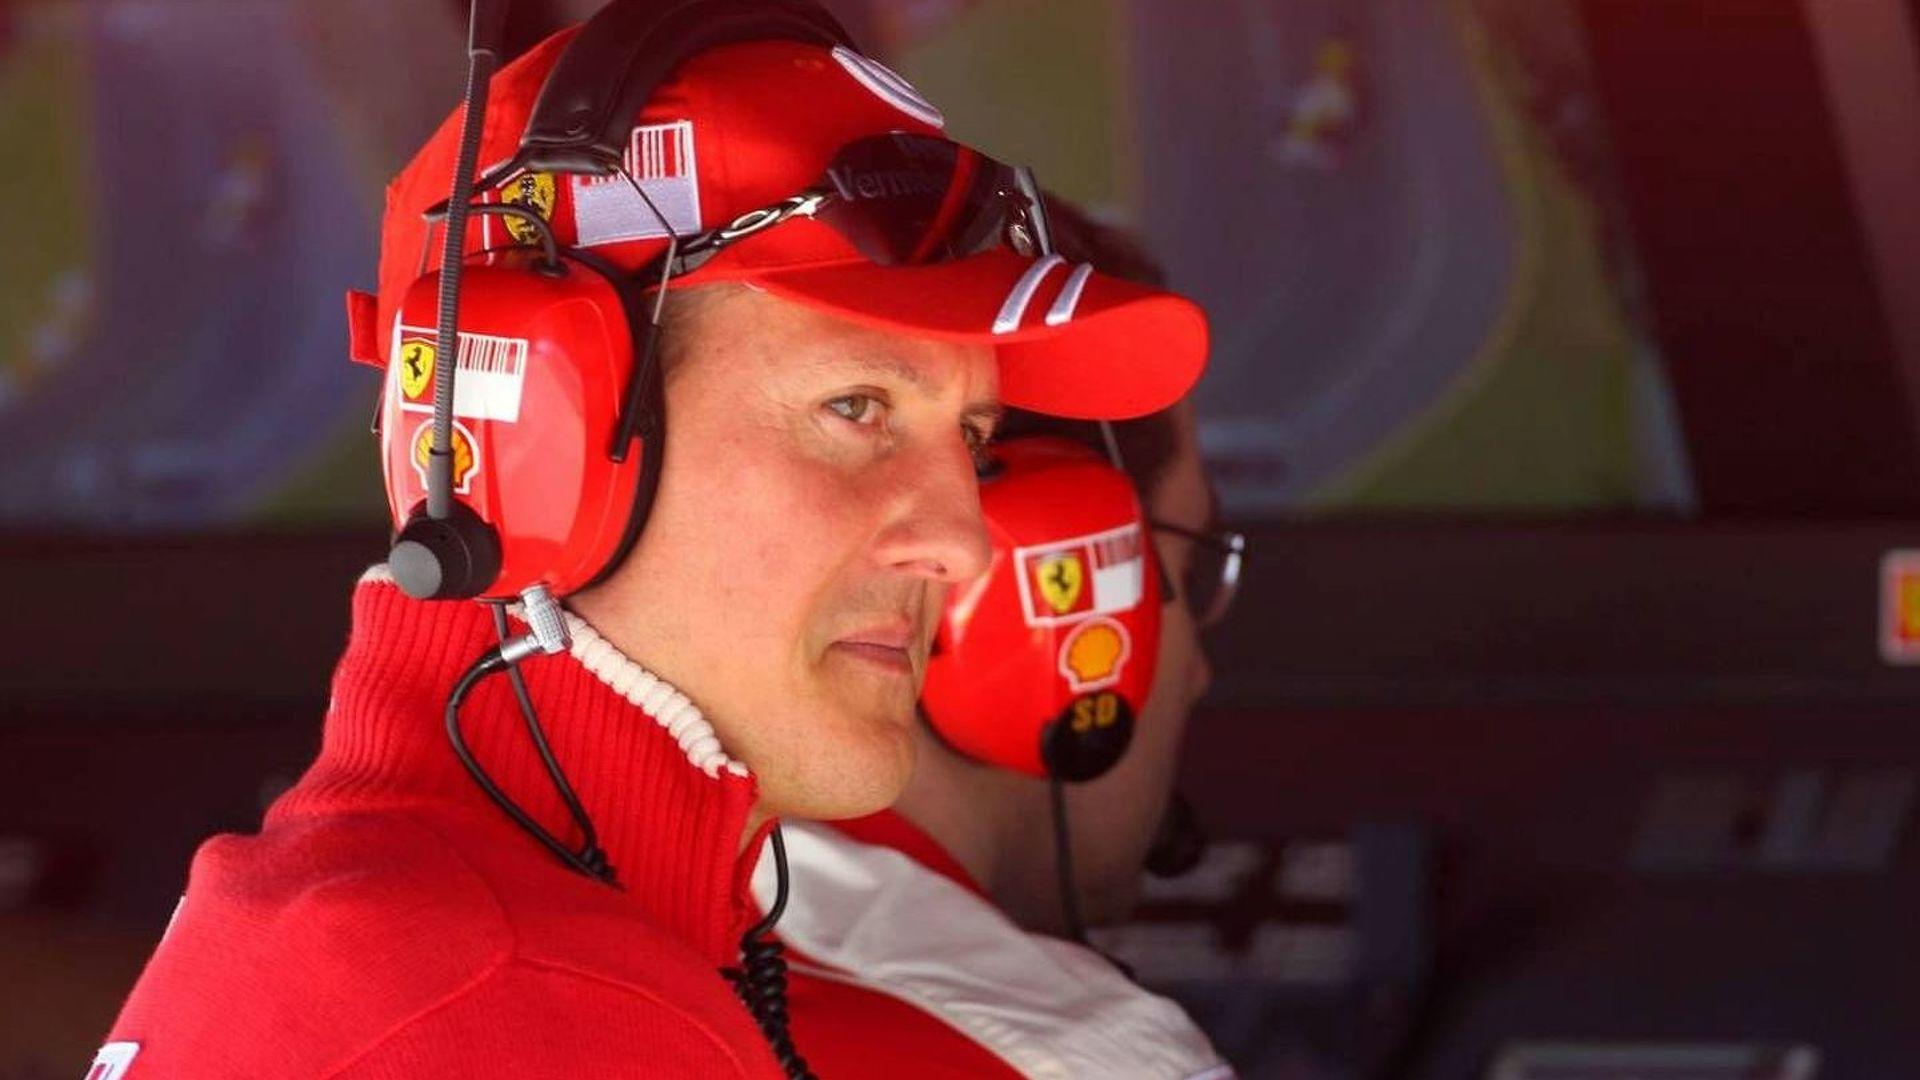 Schumacher to be at Monza - spokeswoman